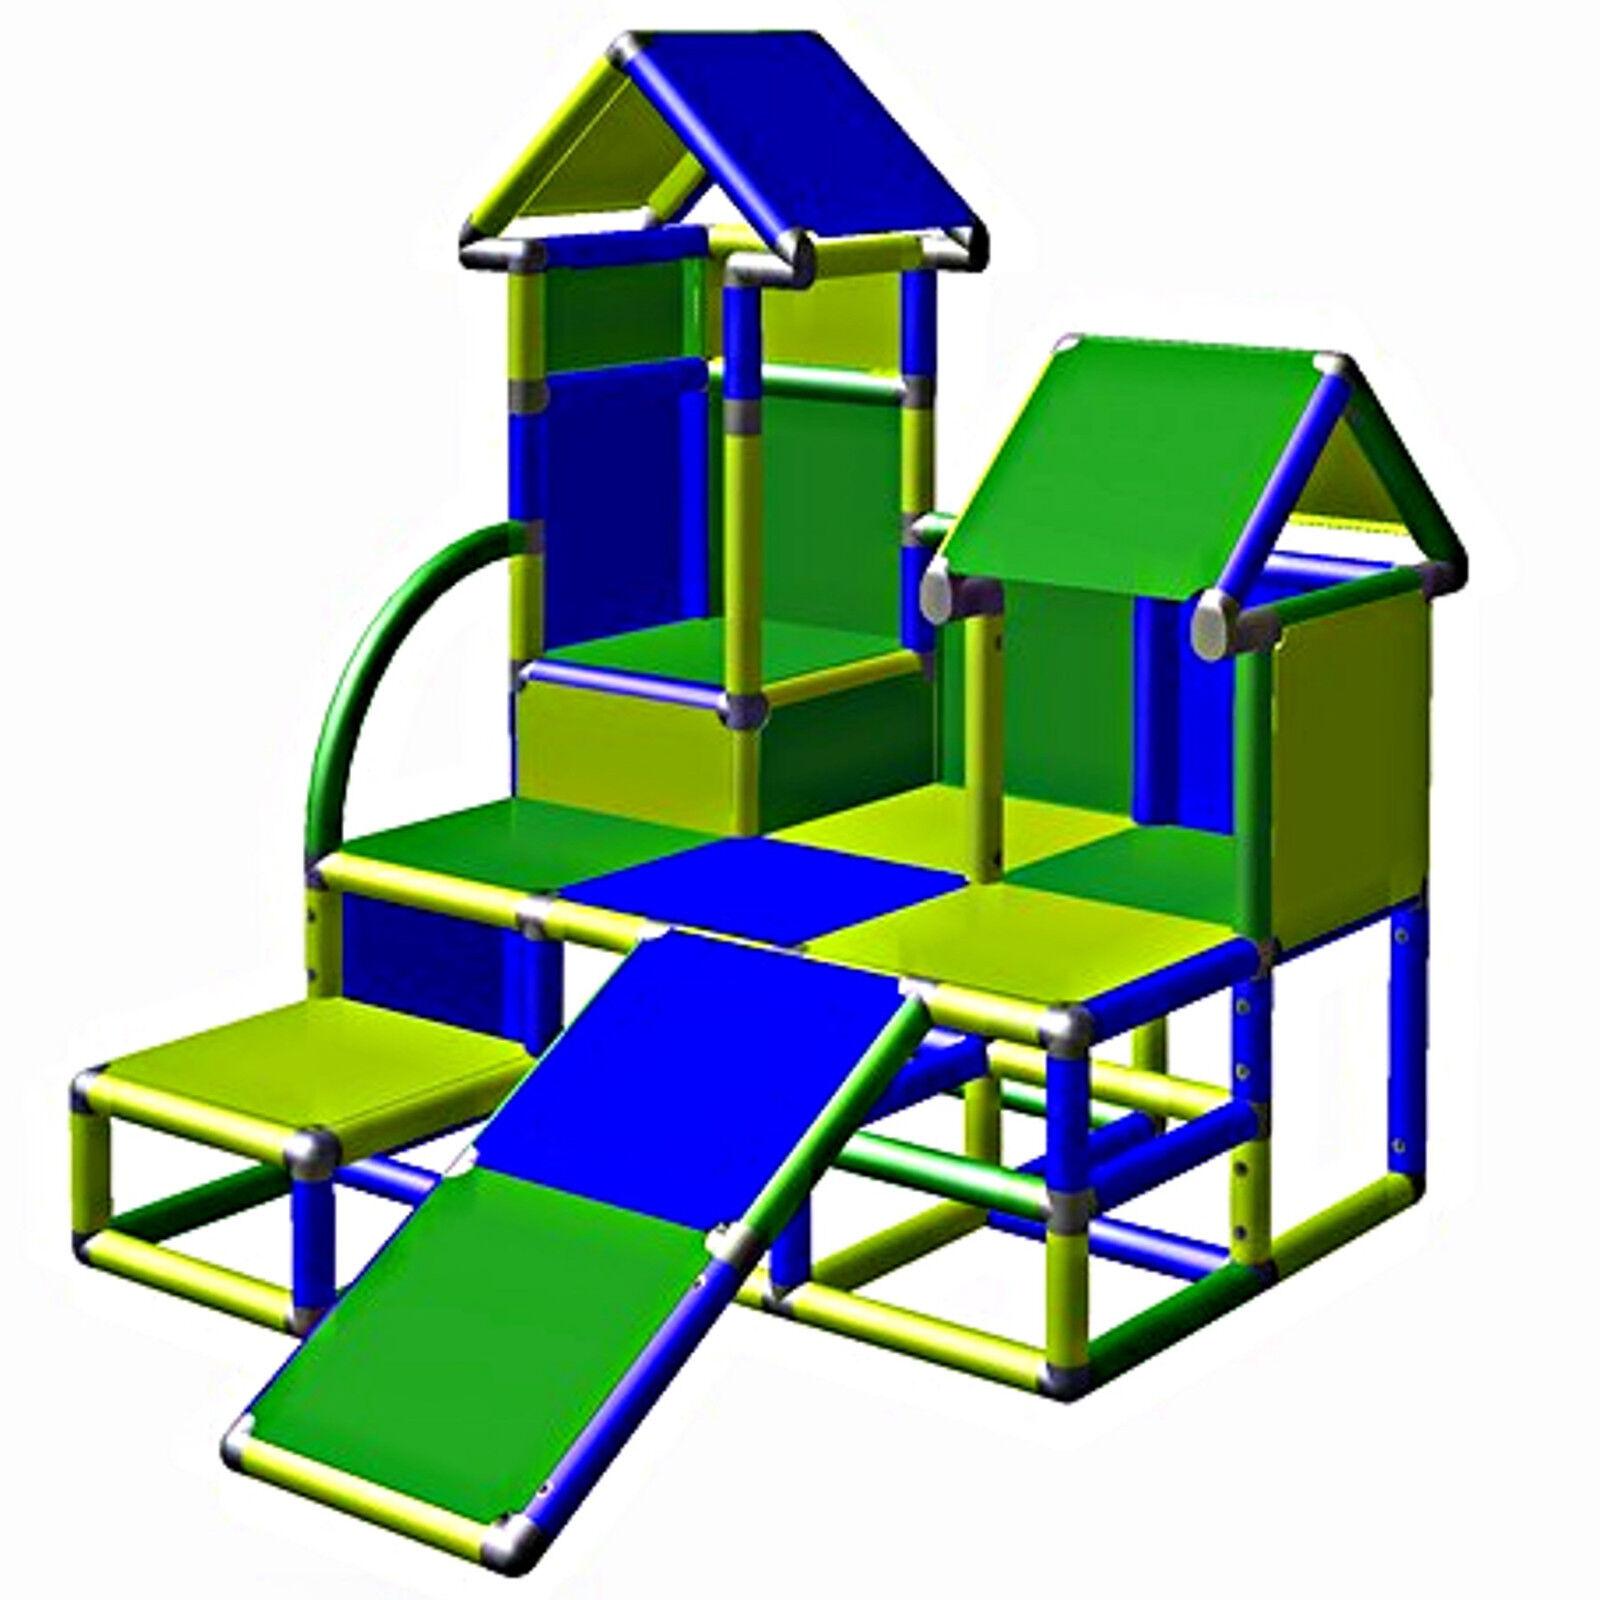 Moveandstic Luise Kletterturm Spielturm Baukasten Klettergerüst Spielgerüst blau